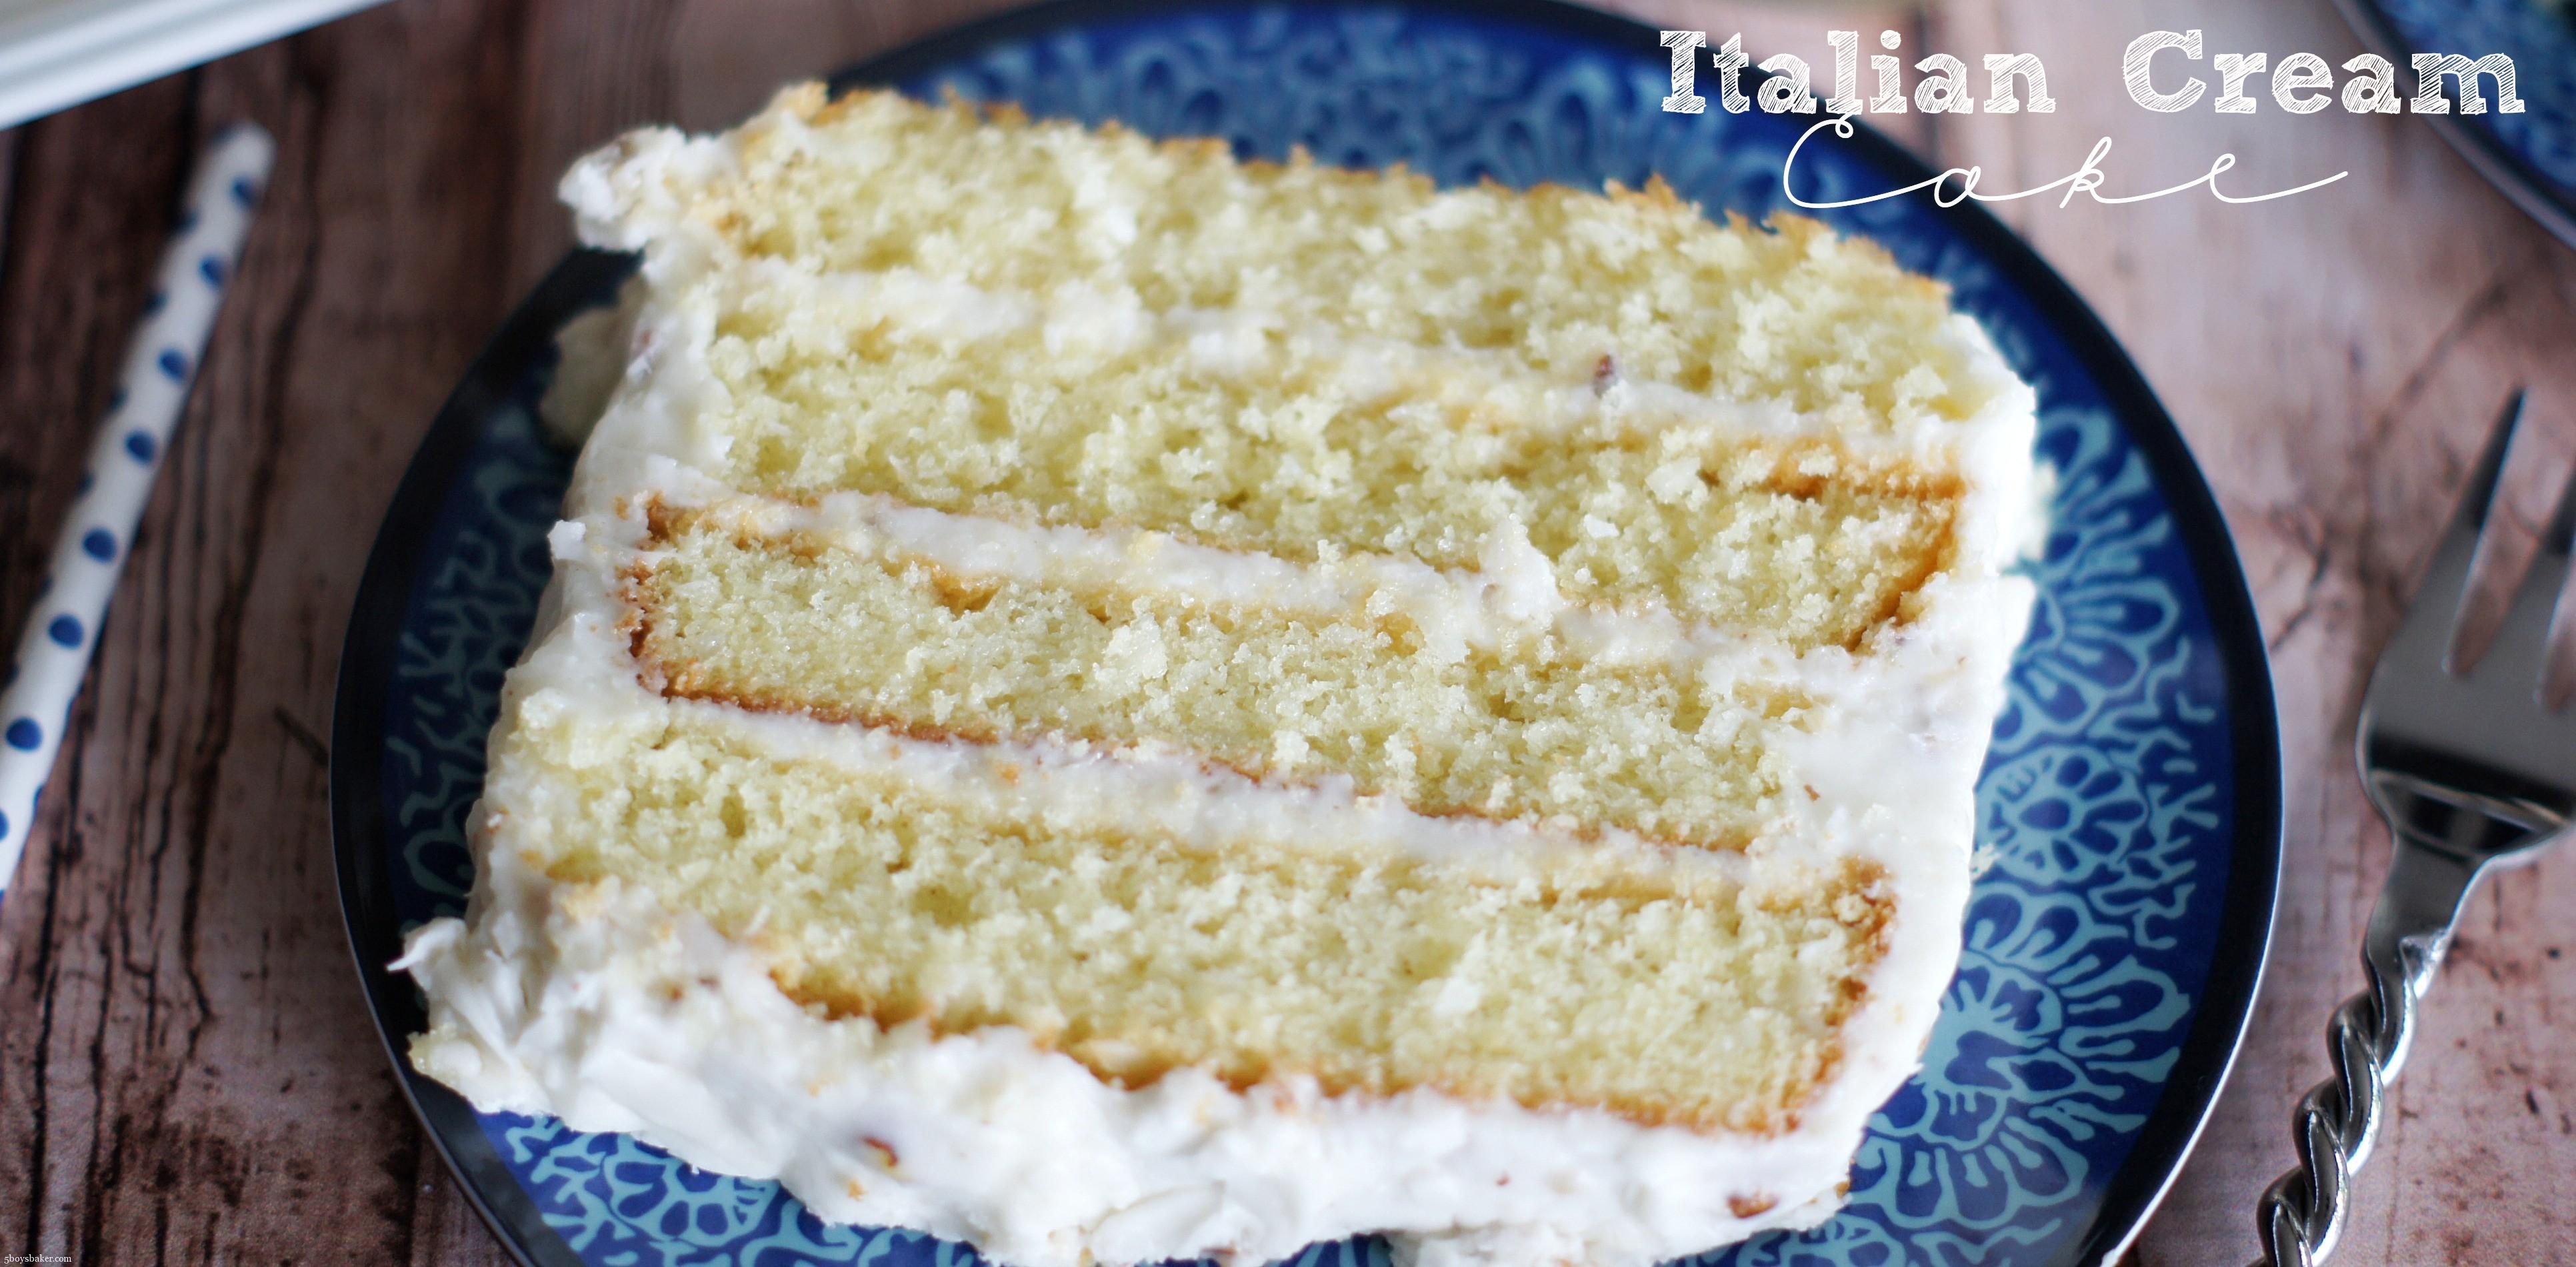 Italian Cream Cake 5 Boys Baker